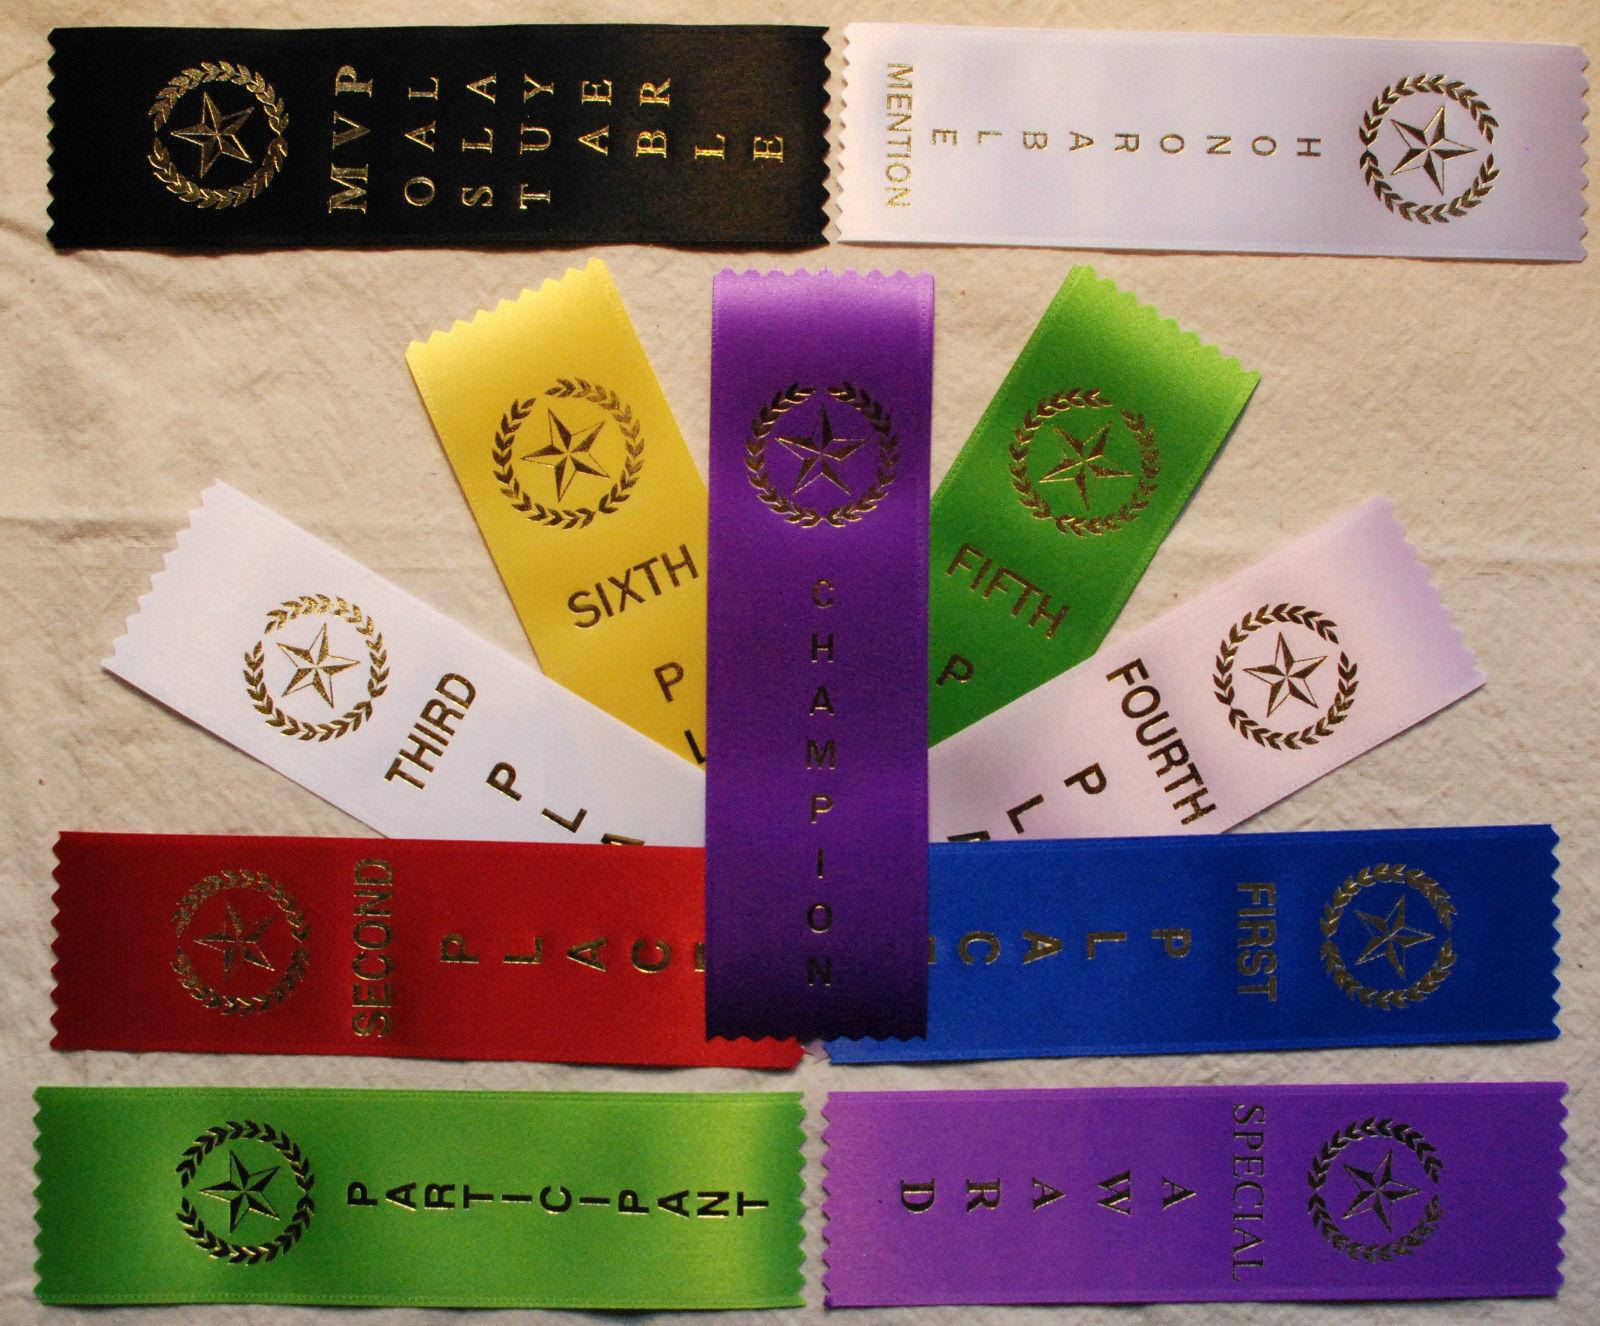 1st-6th Place, Participation Sport Event Prize Participant Ribbons Your choice